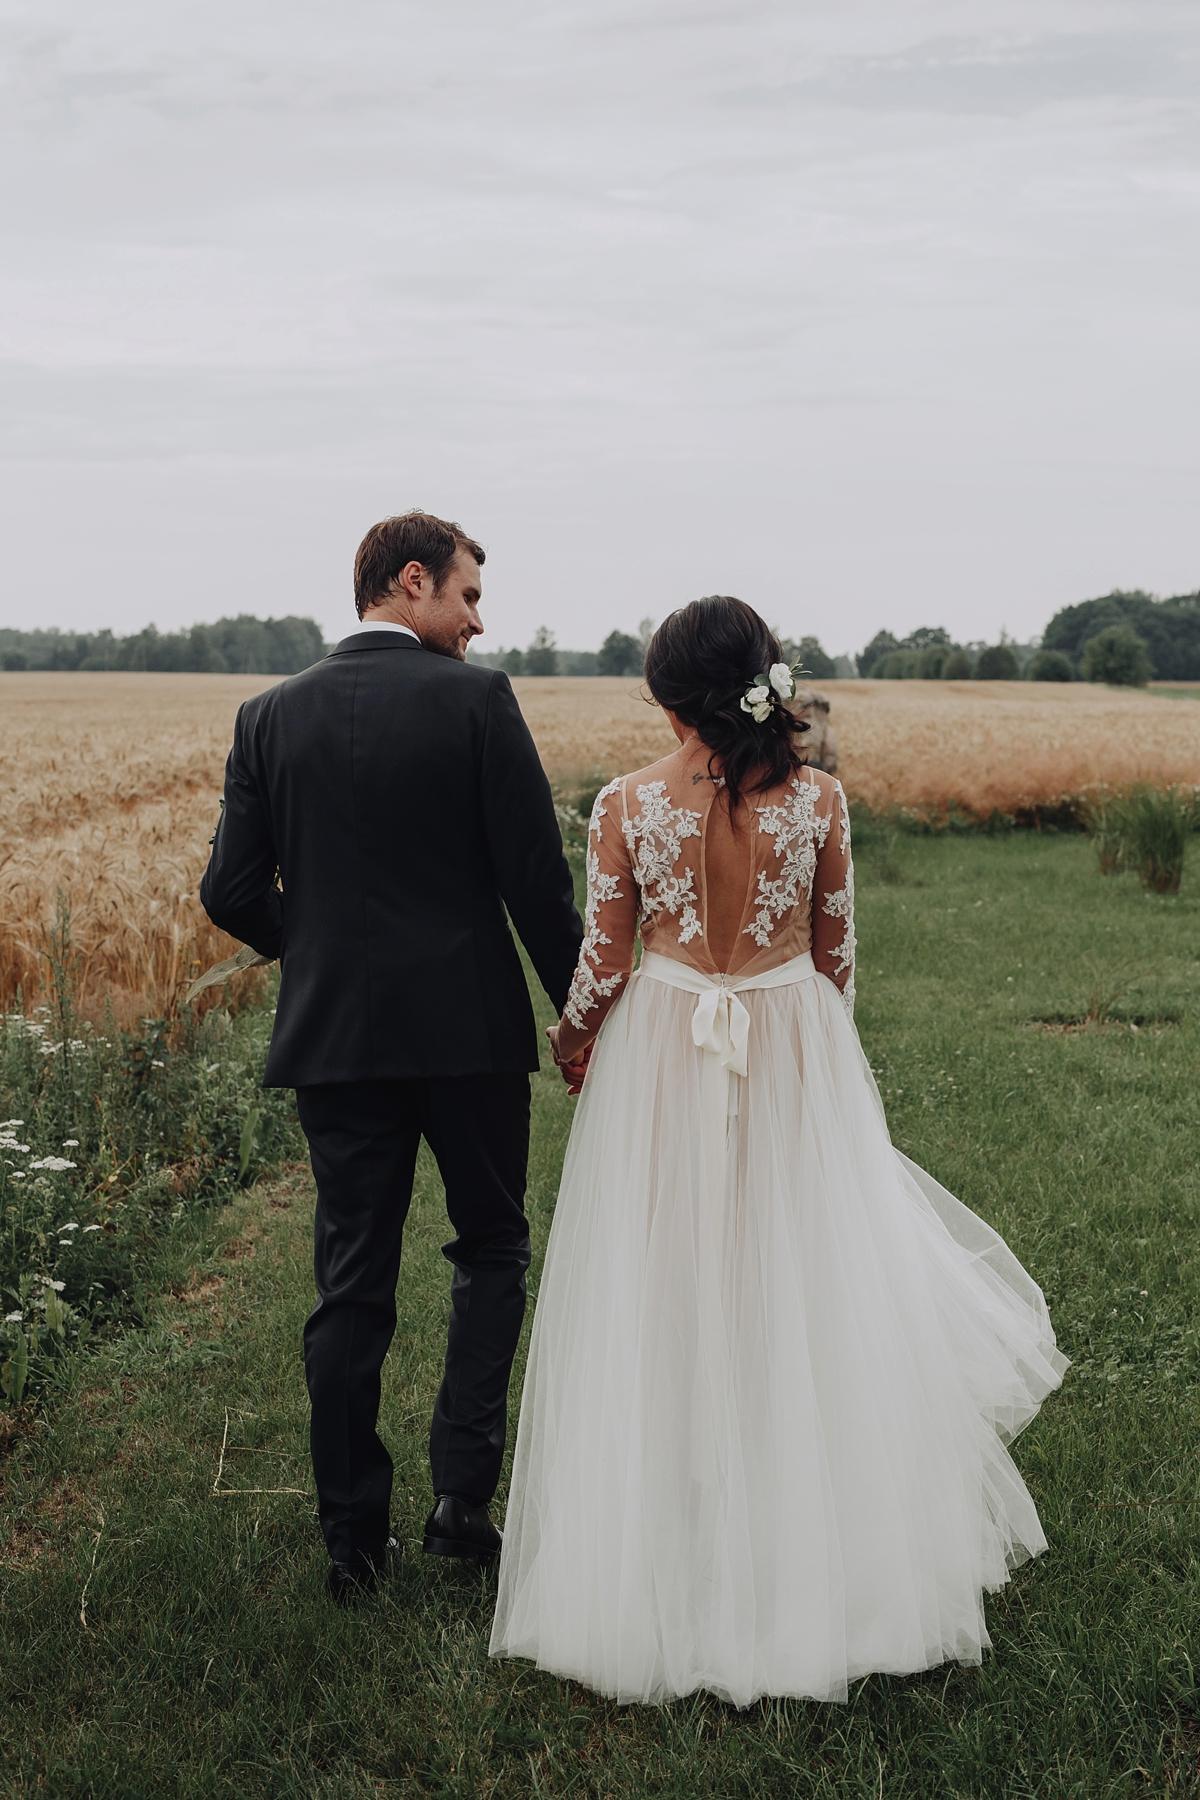 https://www.lovemydress.net/wp-content/uploads/2019/02/Katya-Shehurina-Latvia-Wedding-17.jpg